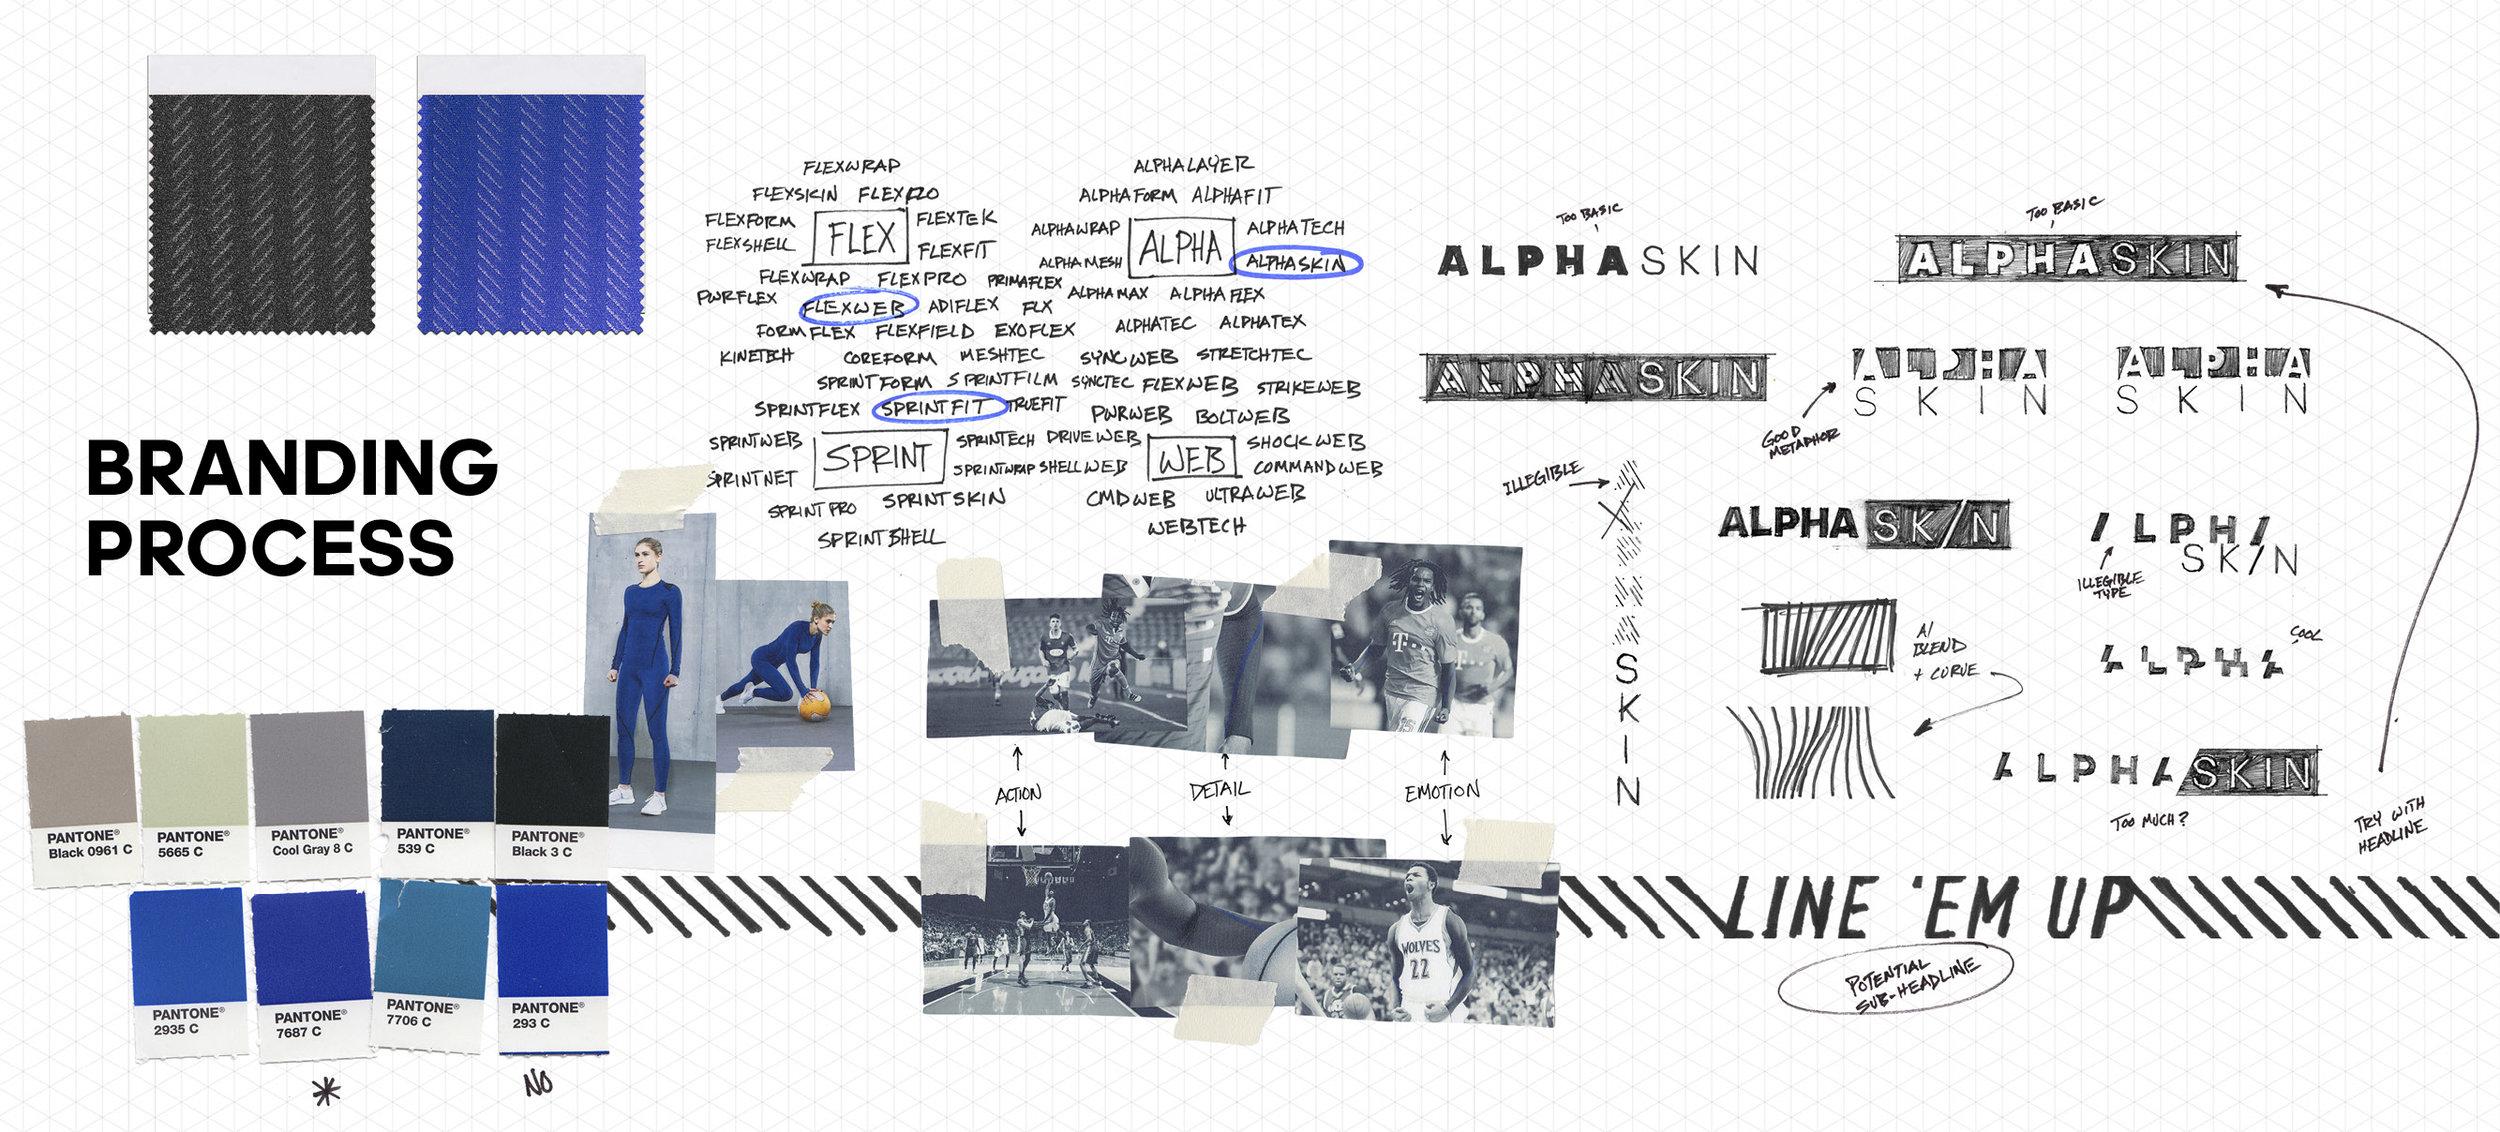 FW18_Alphaskin_Case_Study_1280x580_02.4_main.jpg